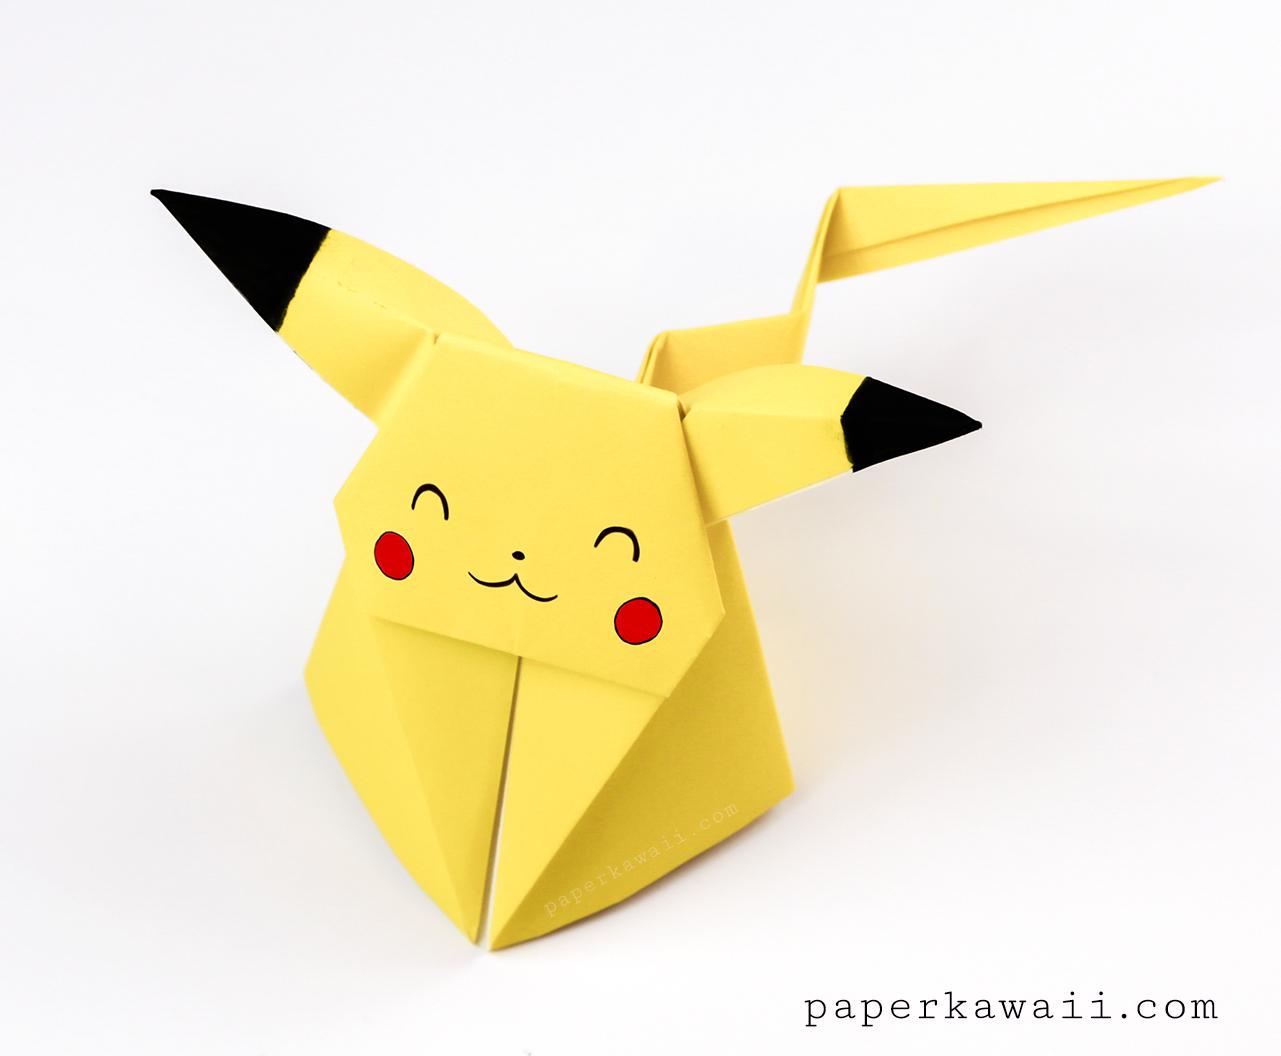 Origami Pikachu Tutorial - Cute Origami Pokemon via @paper_kawaii